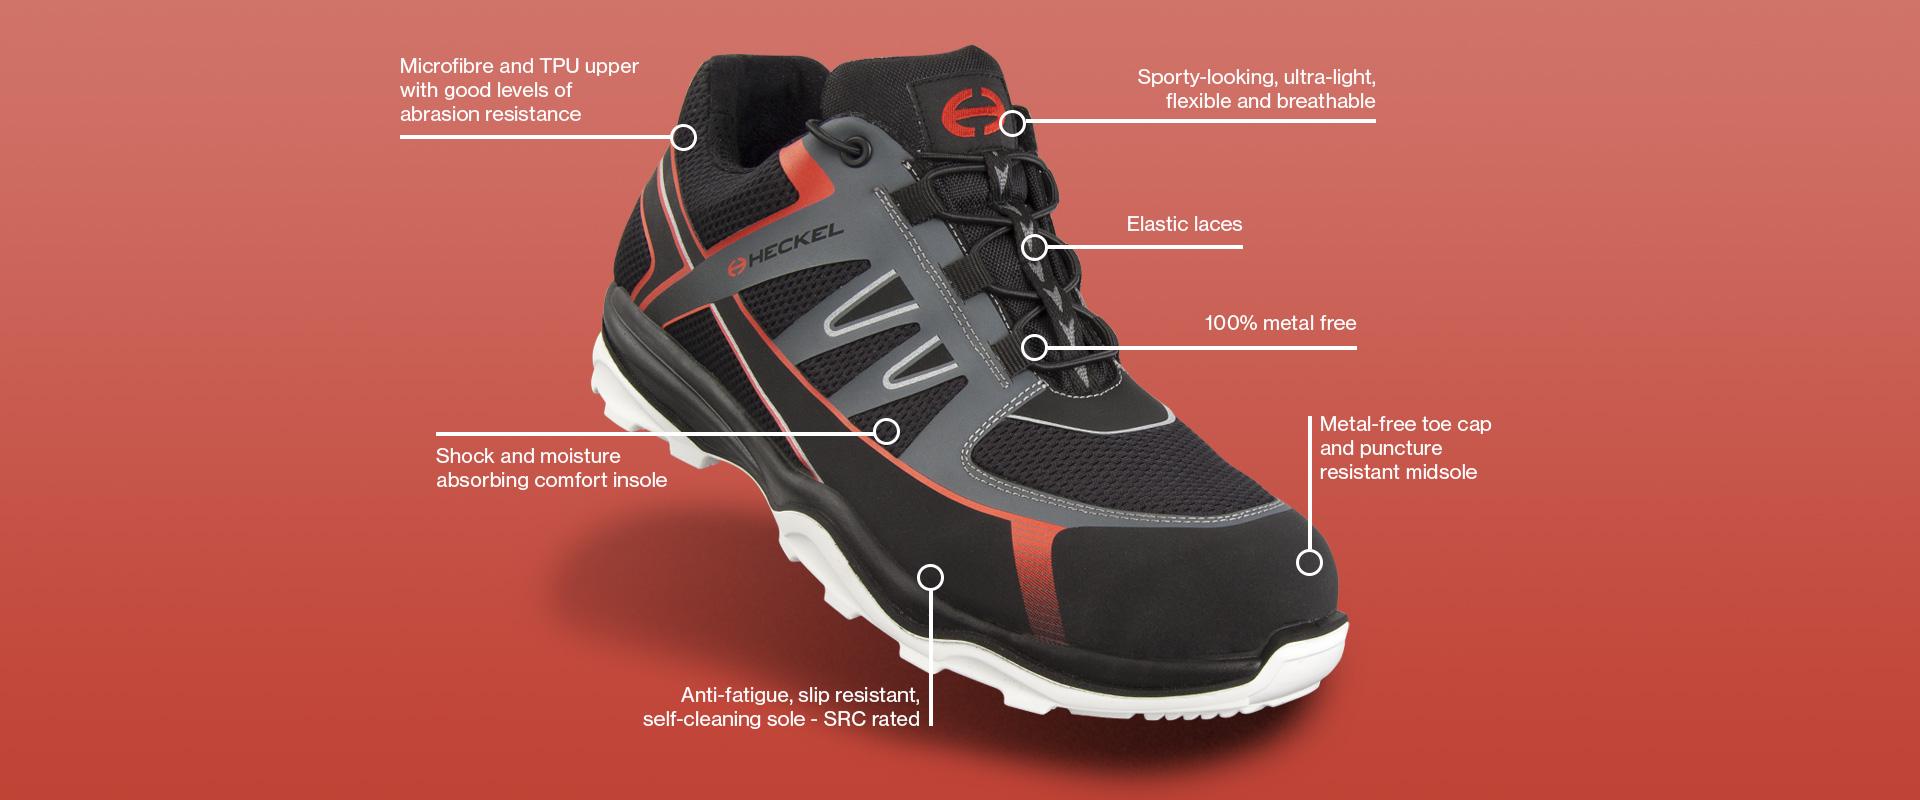 Key benefits of the Heckel Run-R 100